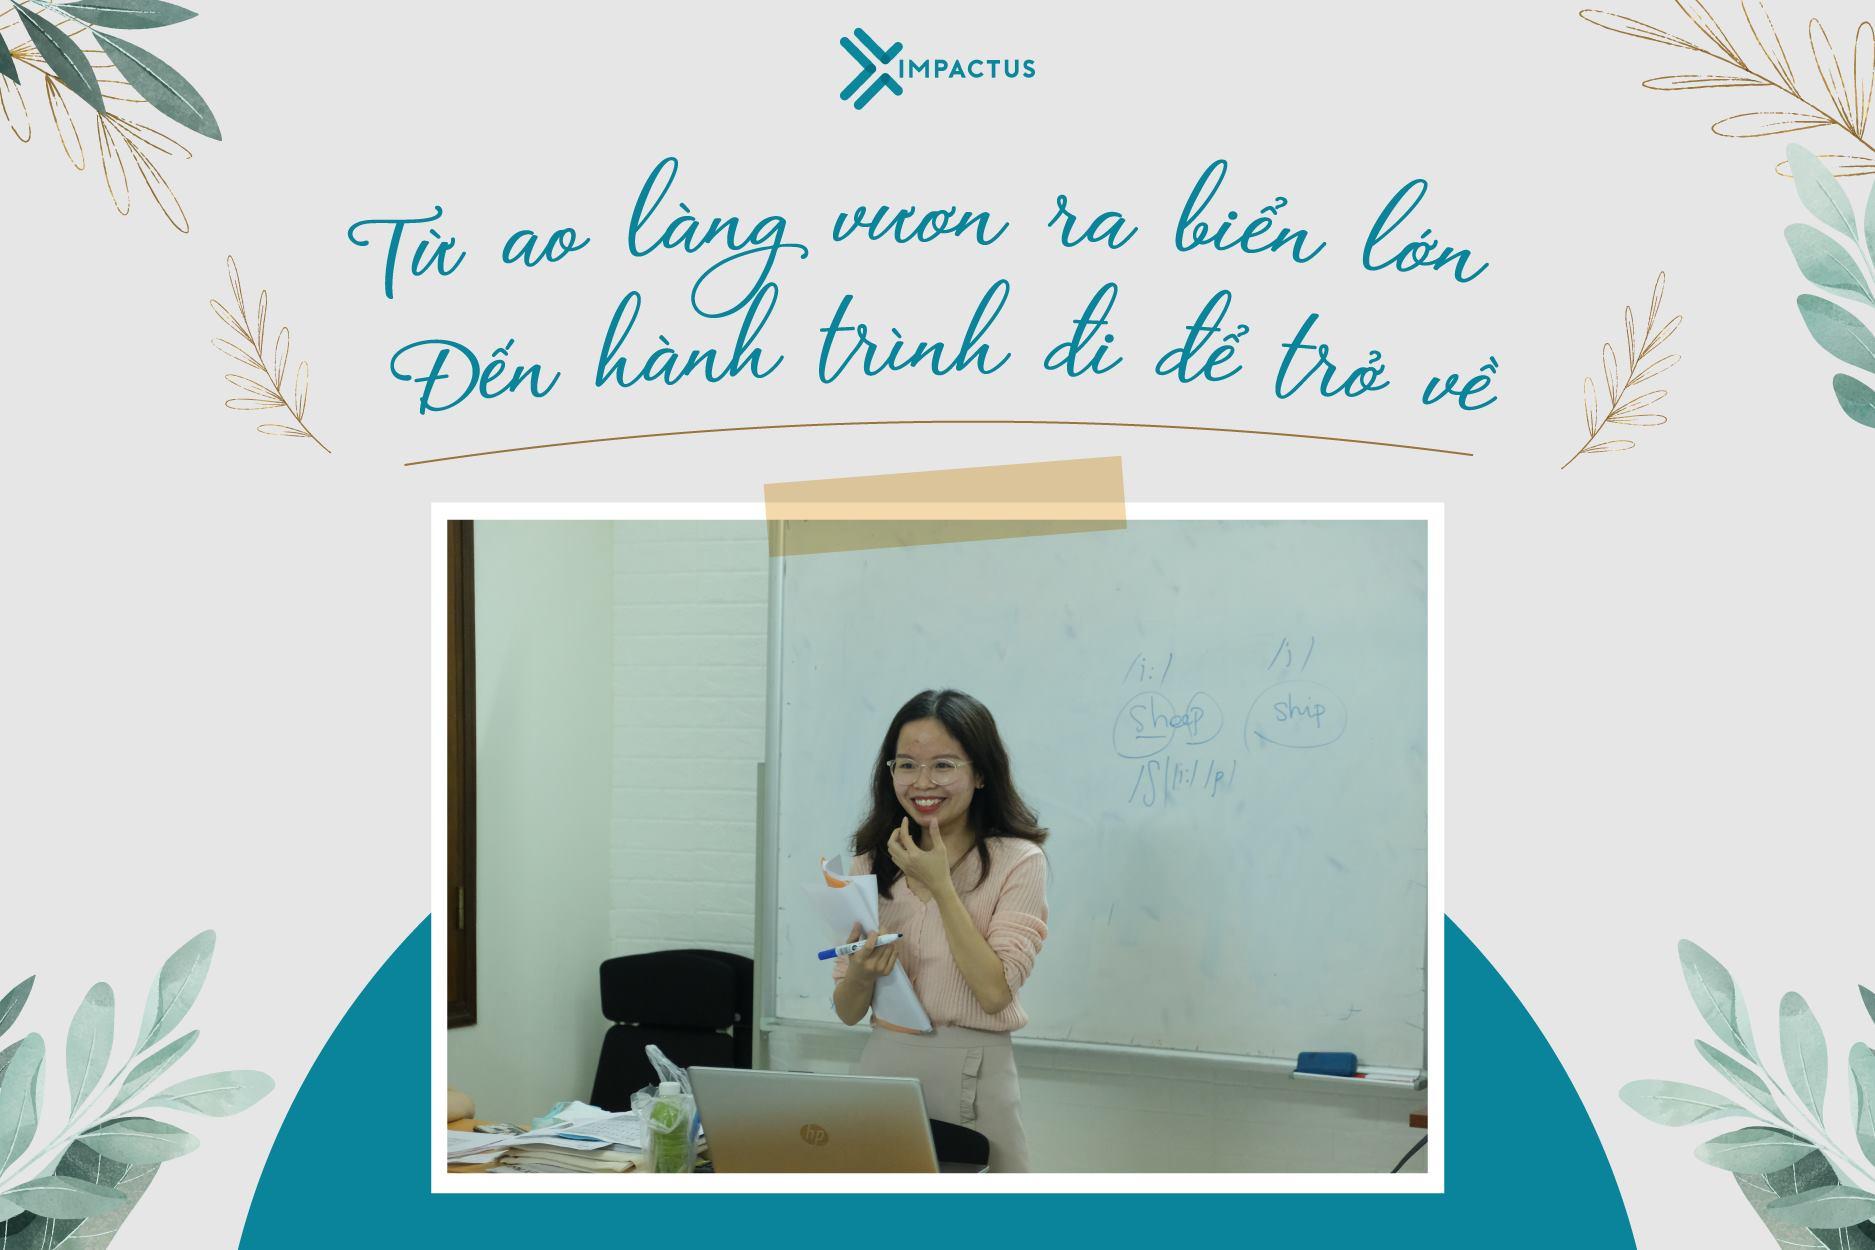 Cô Hoa Nguyễn Impactus